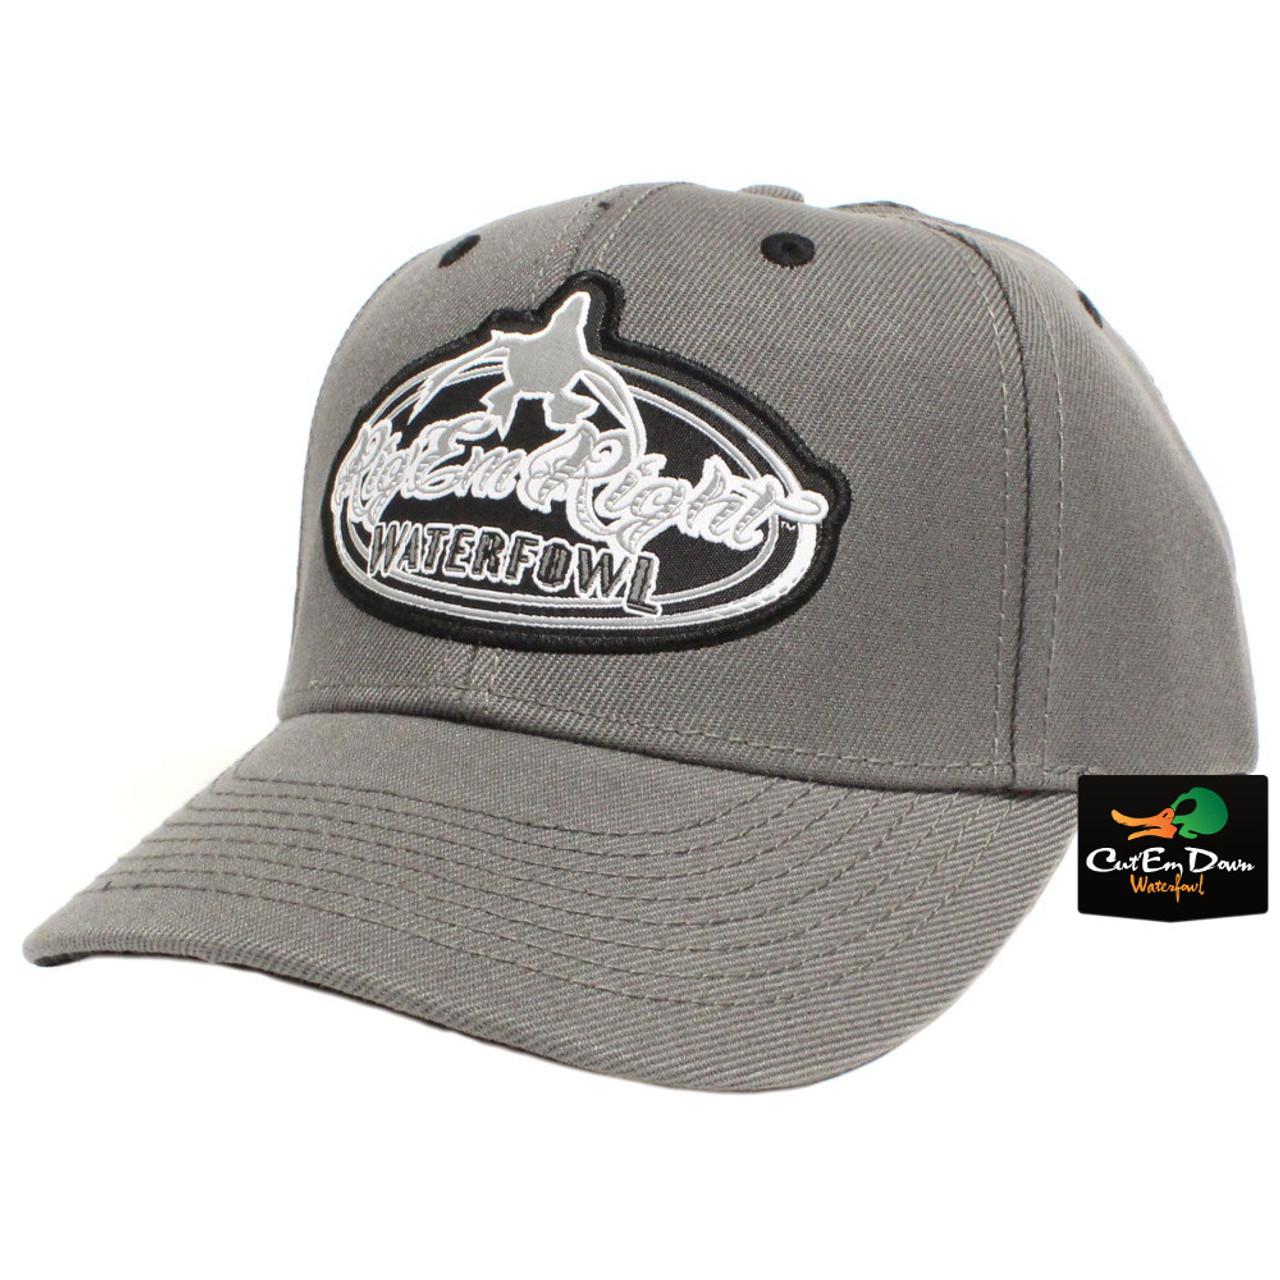 73fccdb20f4 Rig Em Right Waterfowl Solid Gray Hat